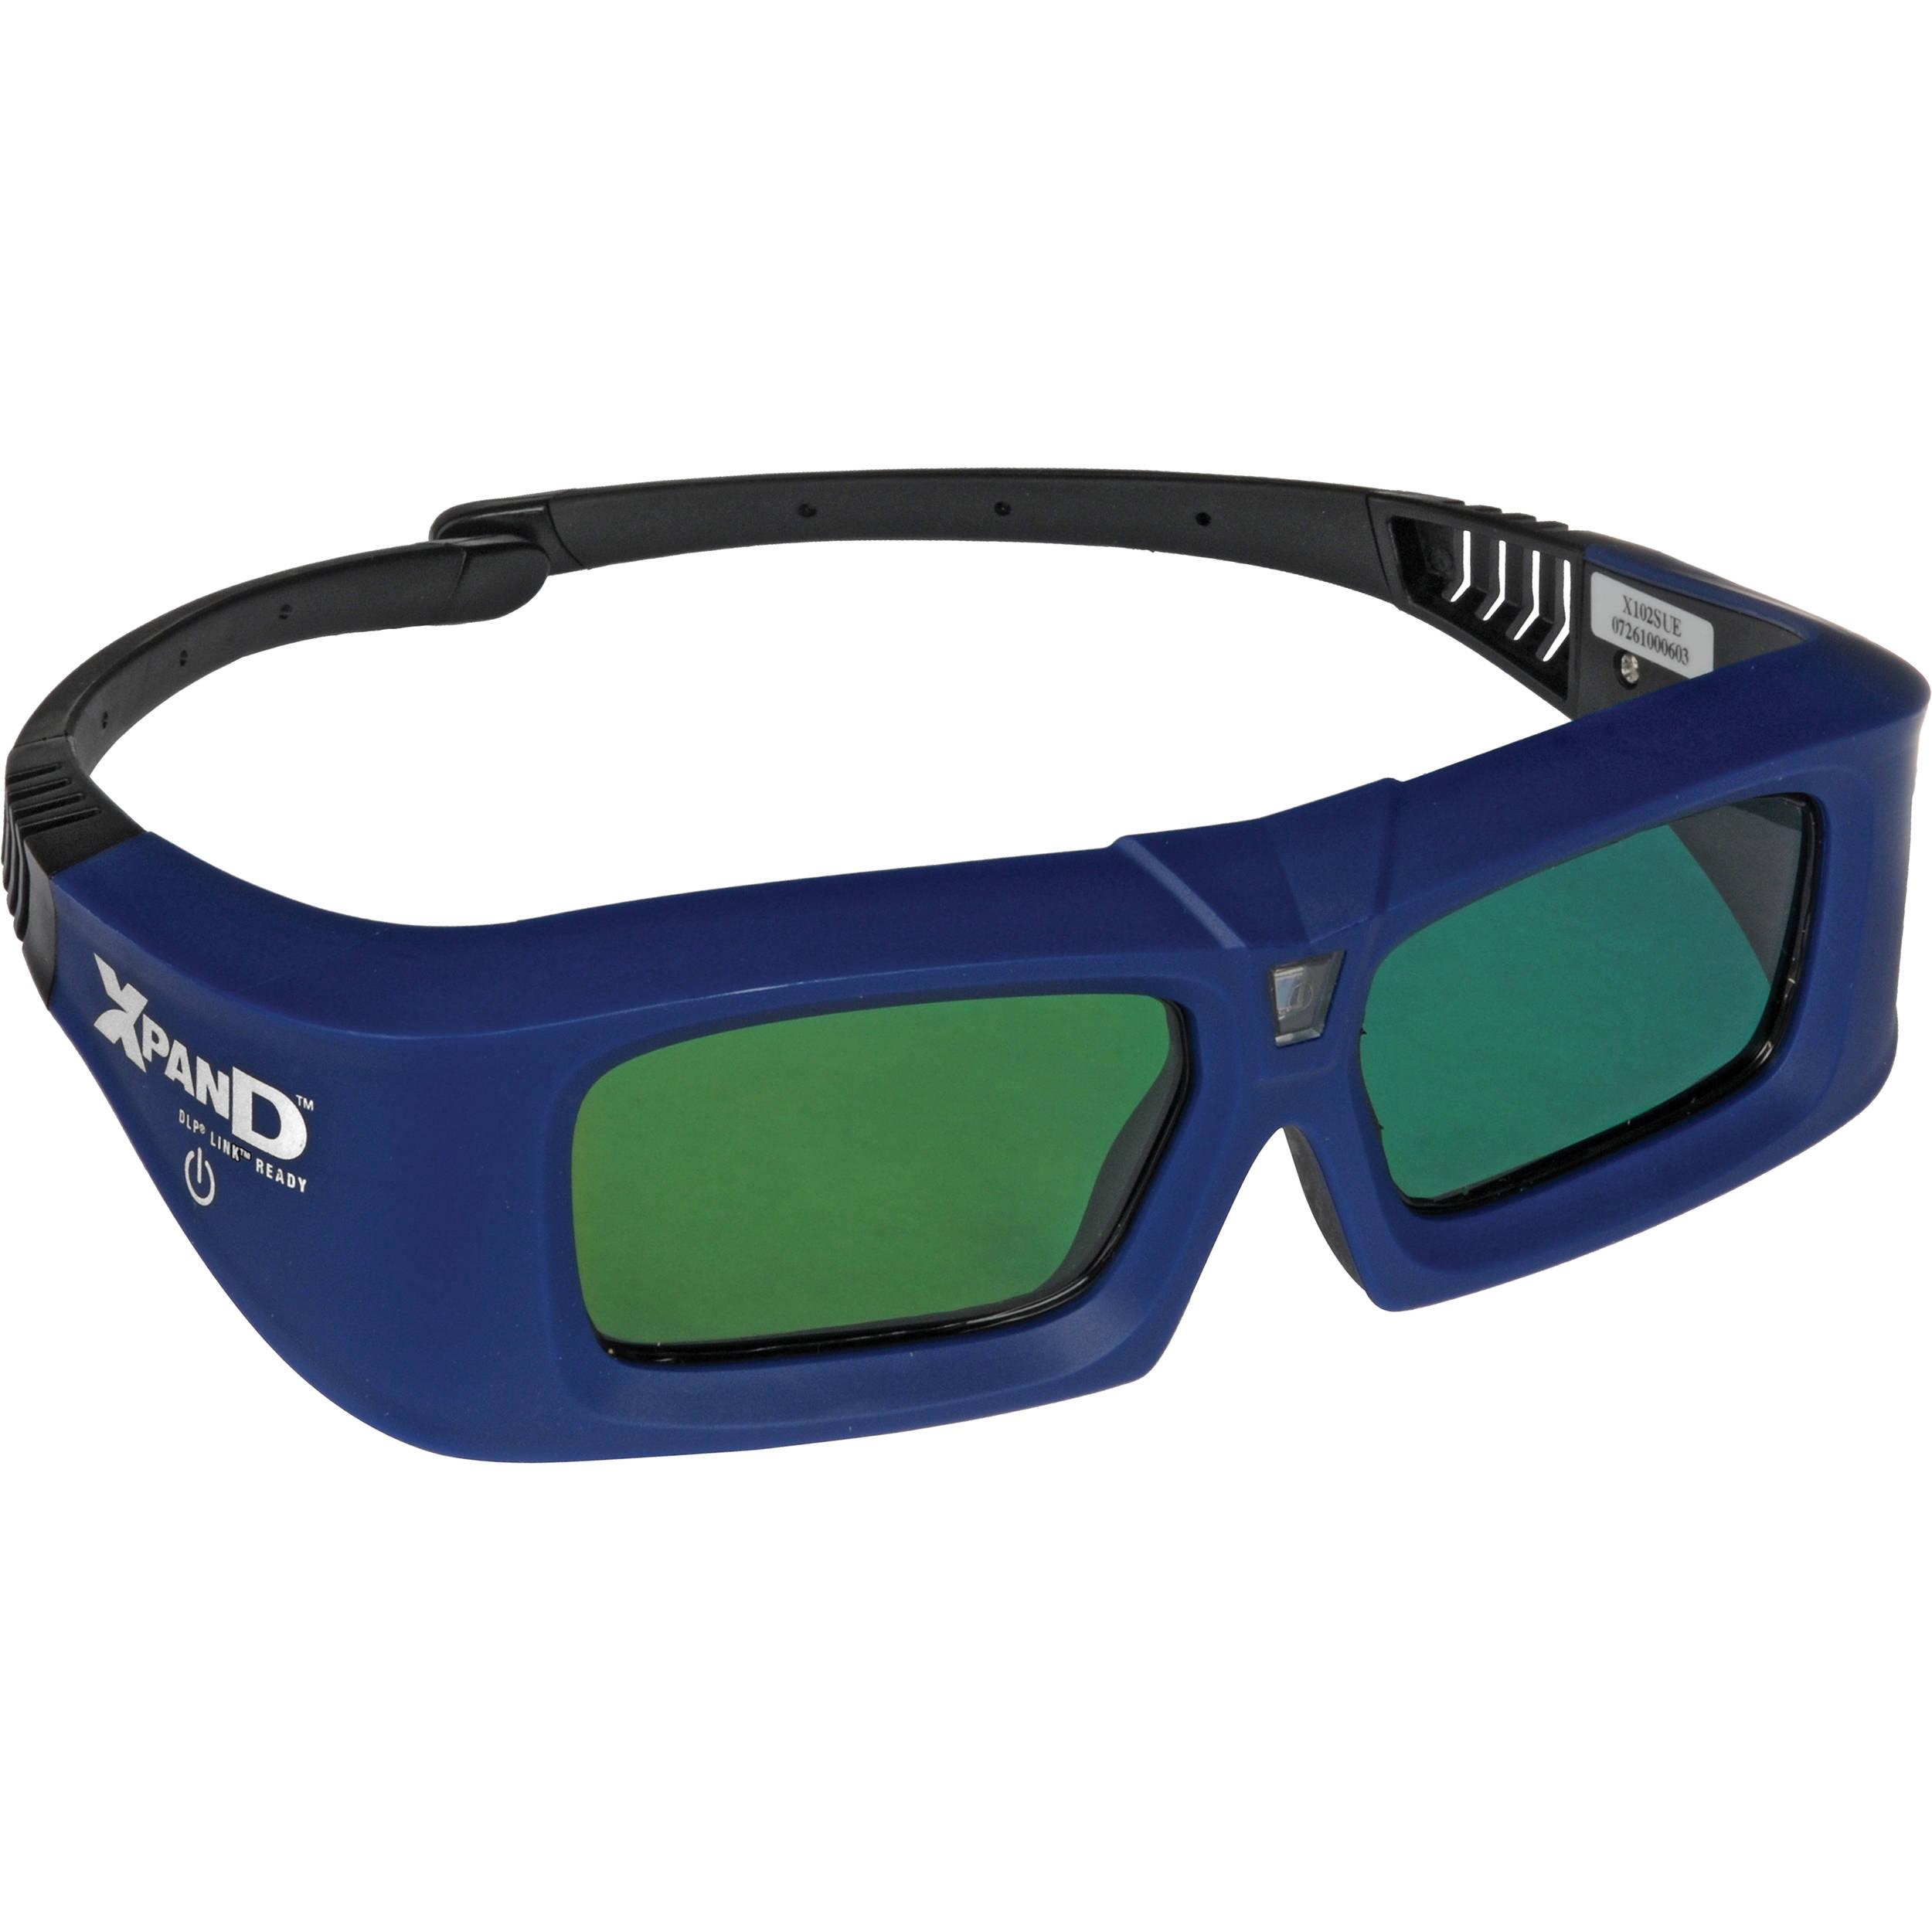 Sharp X102 3D Active Shutter Glasses X102 B&H Photo Video